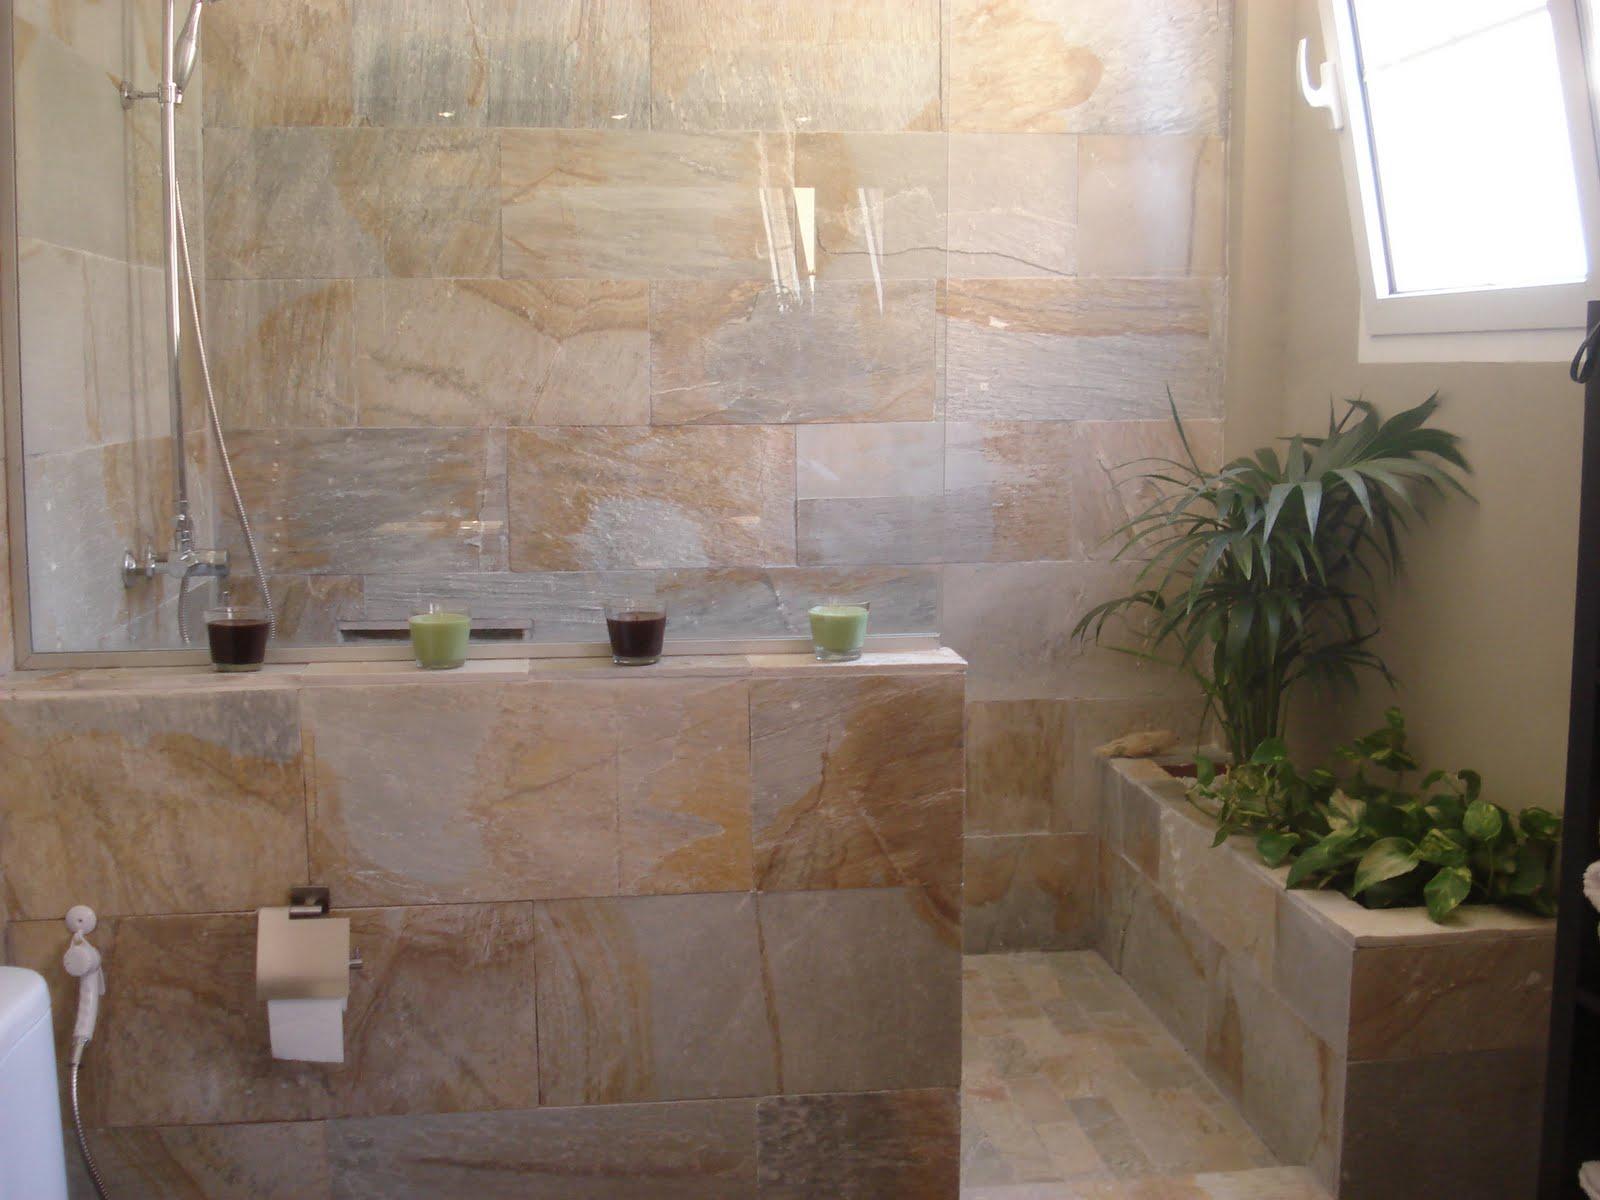 Tatiana doria las duchas for Duchas de obra leroy merlin